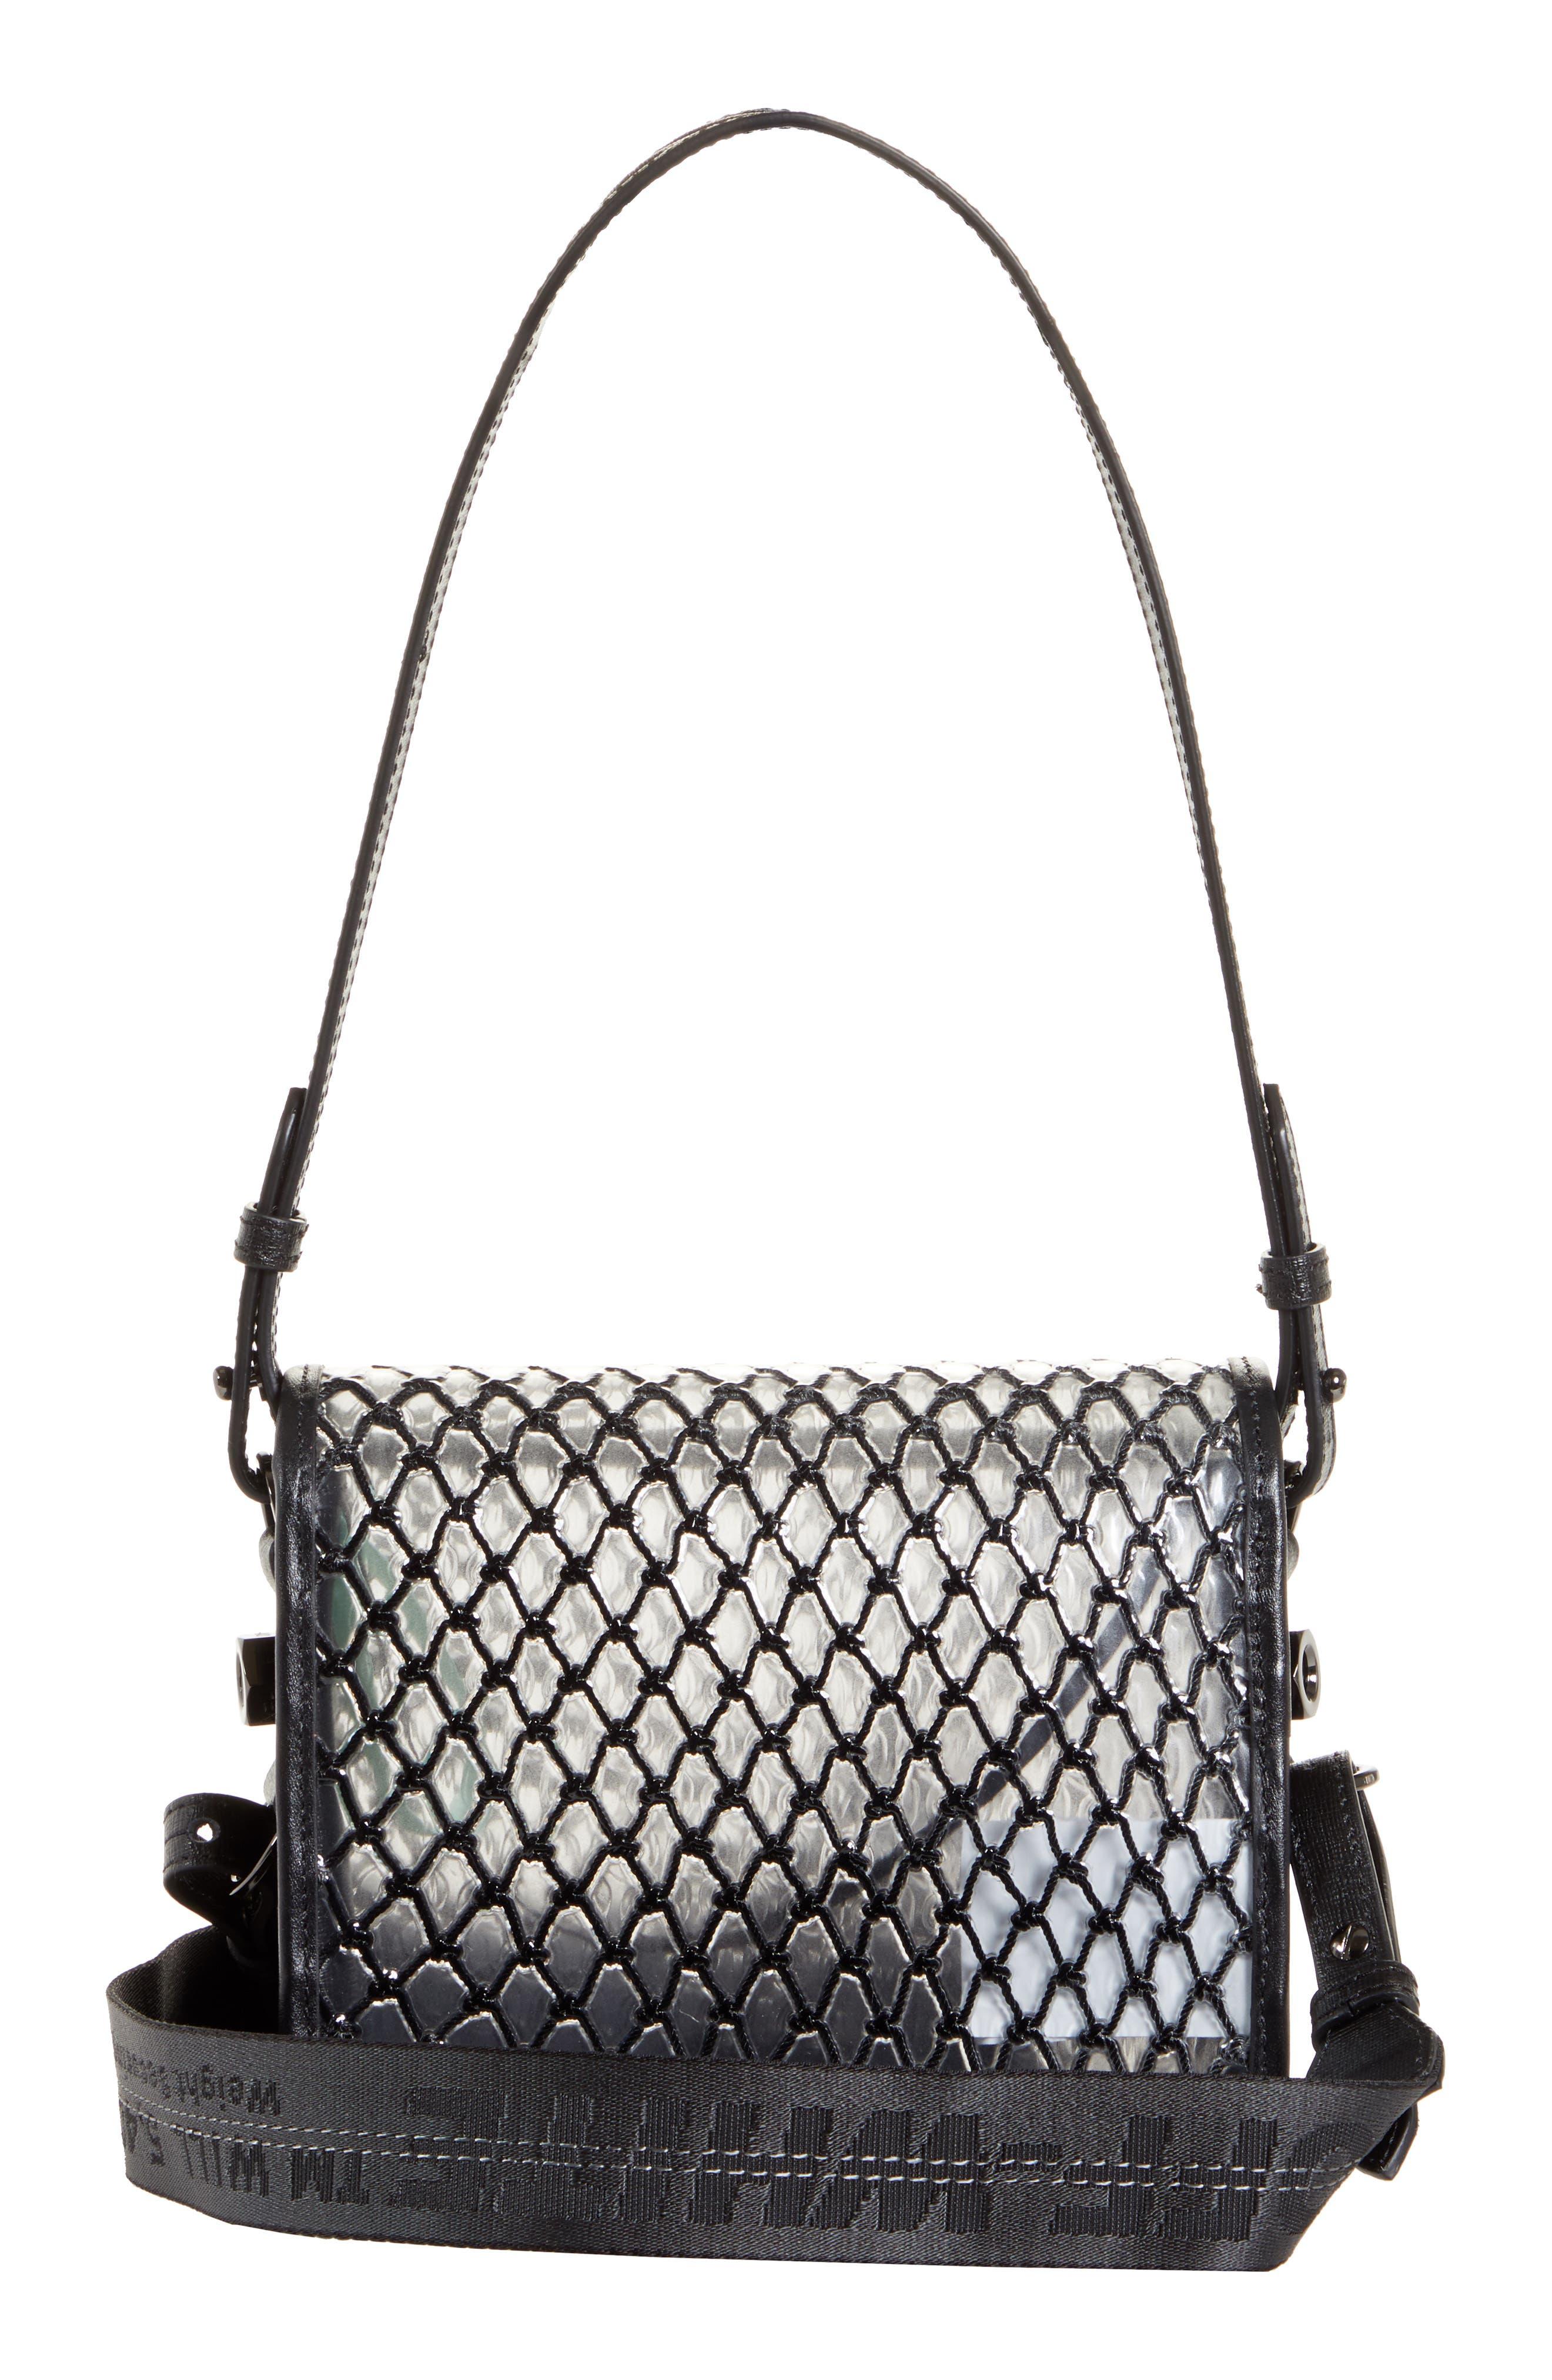 OFF-WHITE, Net PVC Flap Bag, Alternate thumbnail 4, color, BLACK